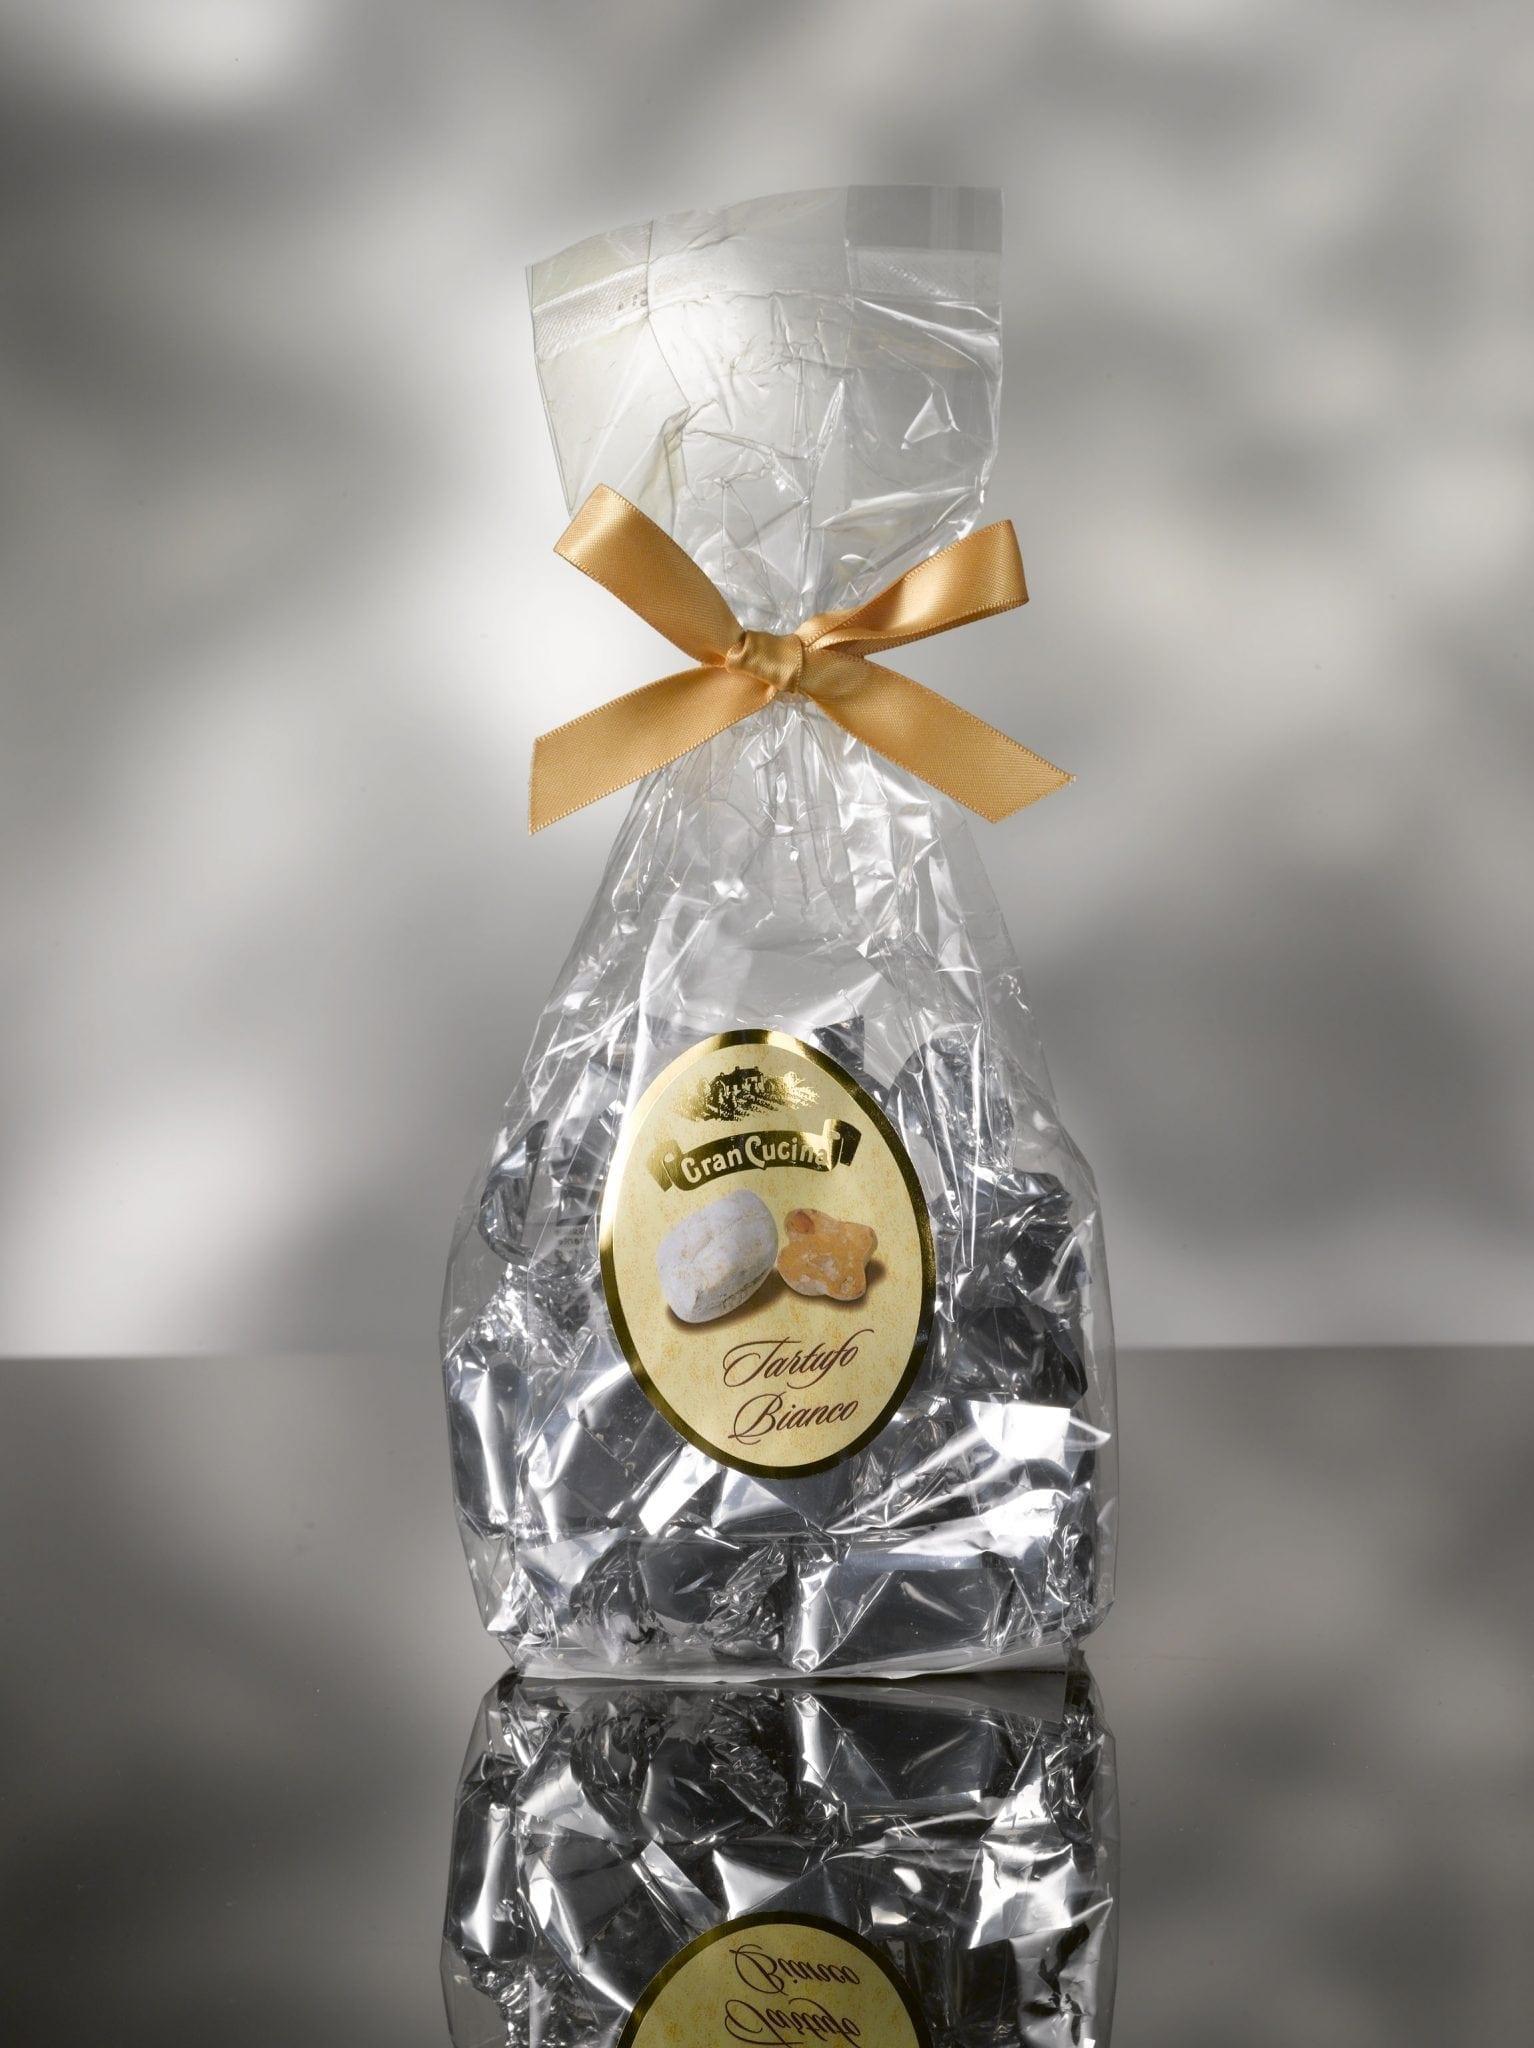 Cran Cucina White cholate truffle 200 gr